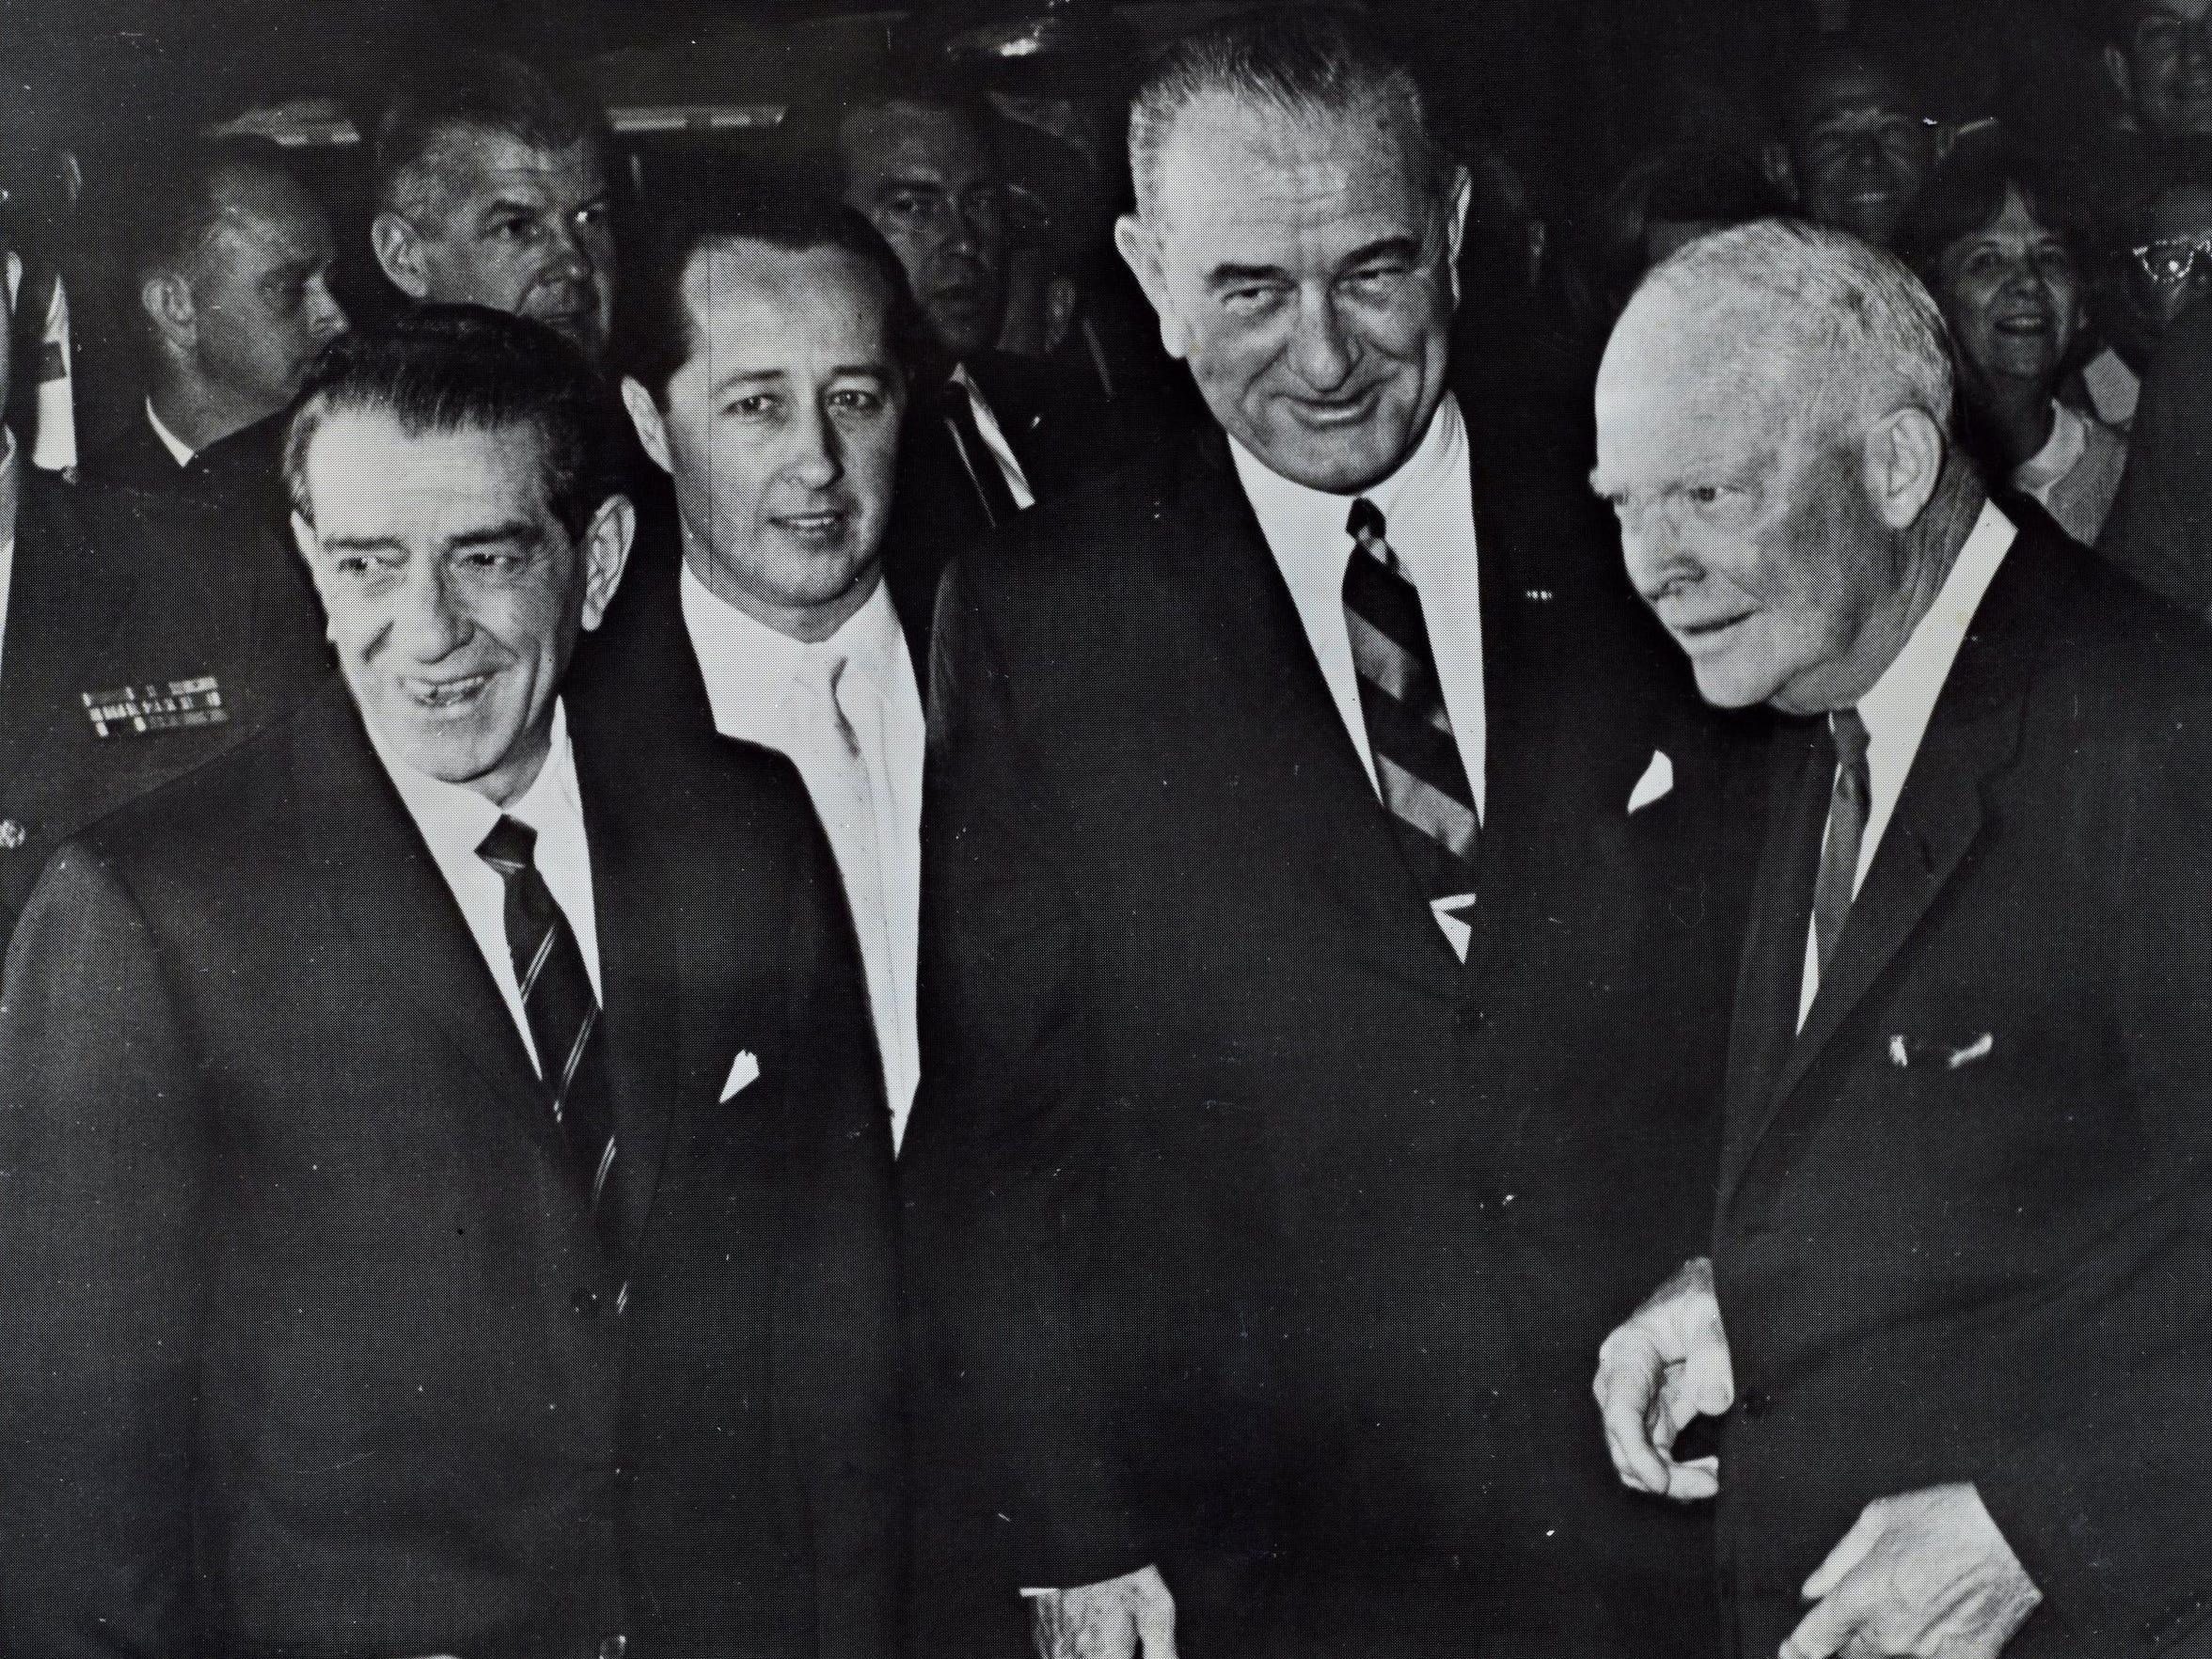 Mexico's President Adolfo López Mateos, unidentified